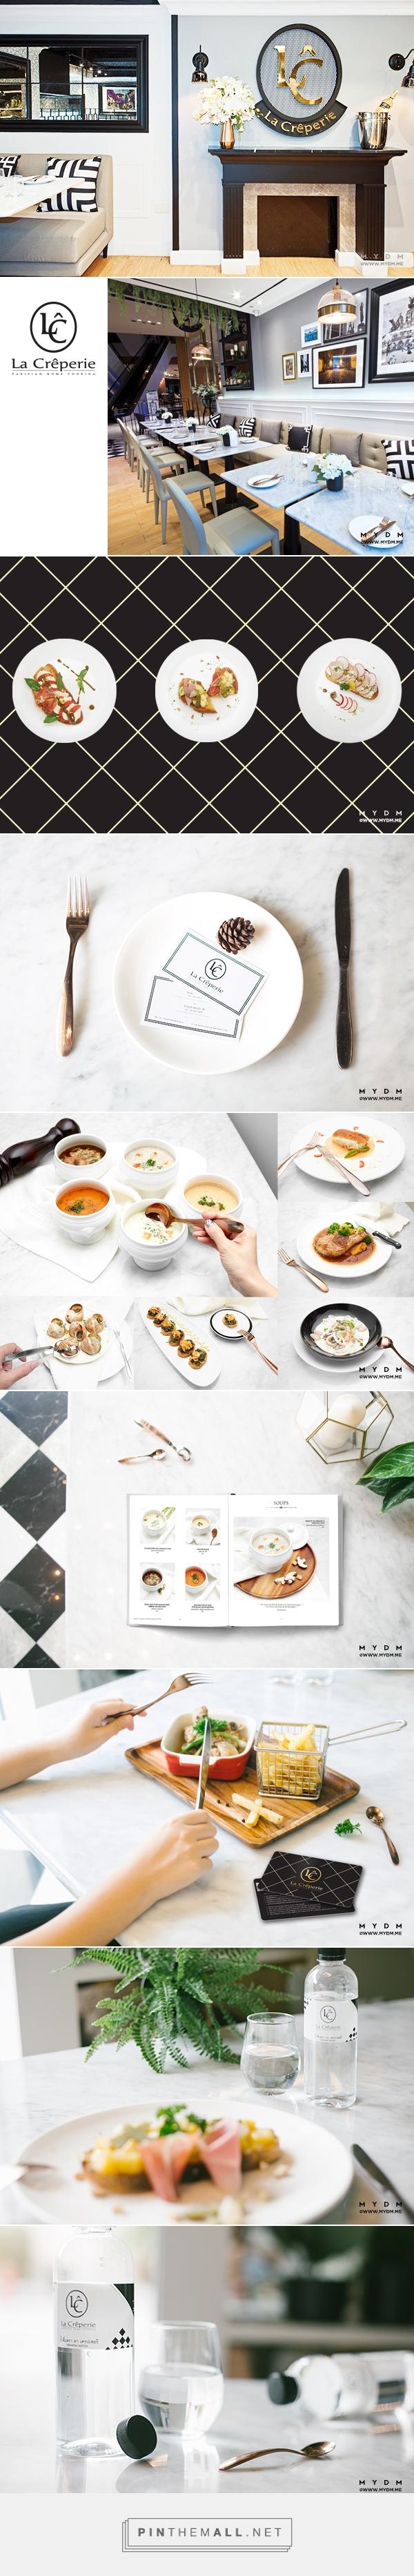 MYDM has created identity, menu design, food styling, including ...